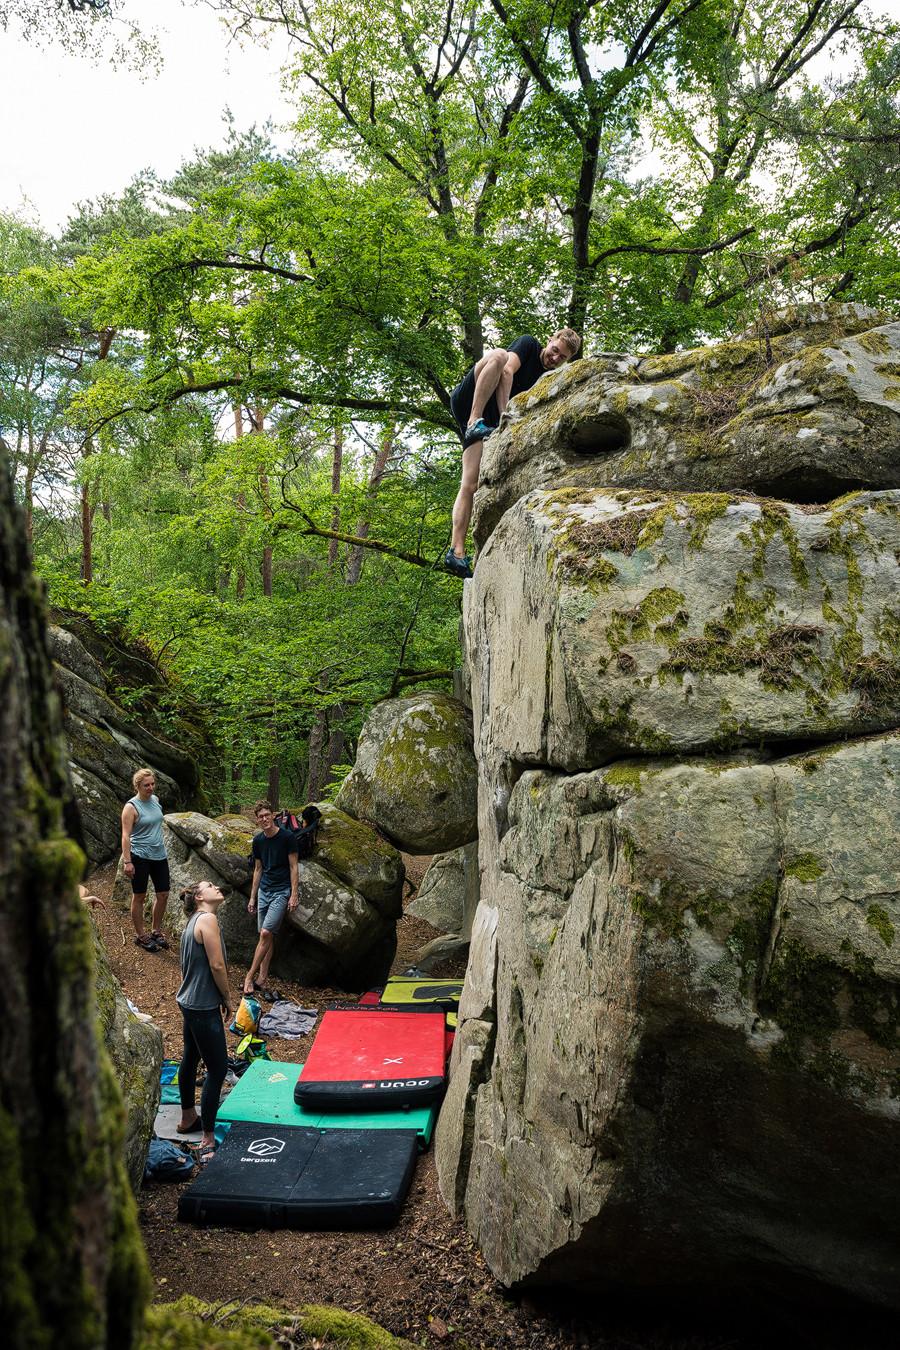 Highball: Bouldern Sportfotografie bastianpaas.de Fontainebleau